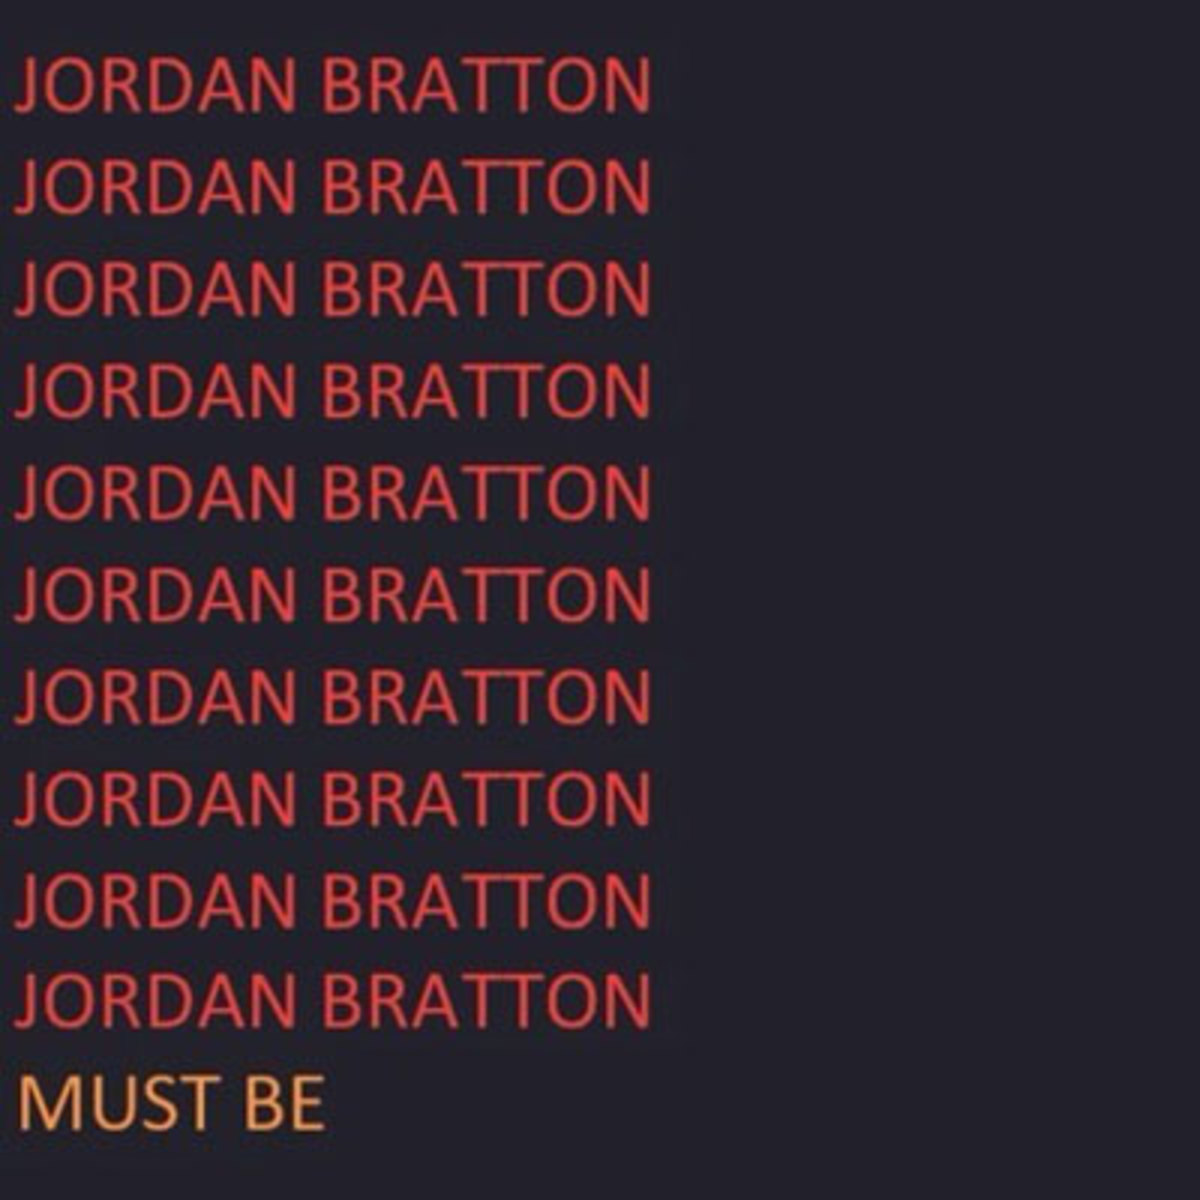 jordanbratton-mustbe.jpg